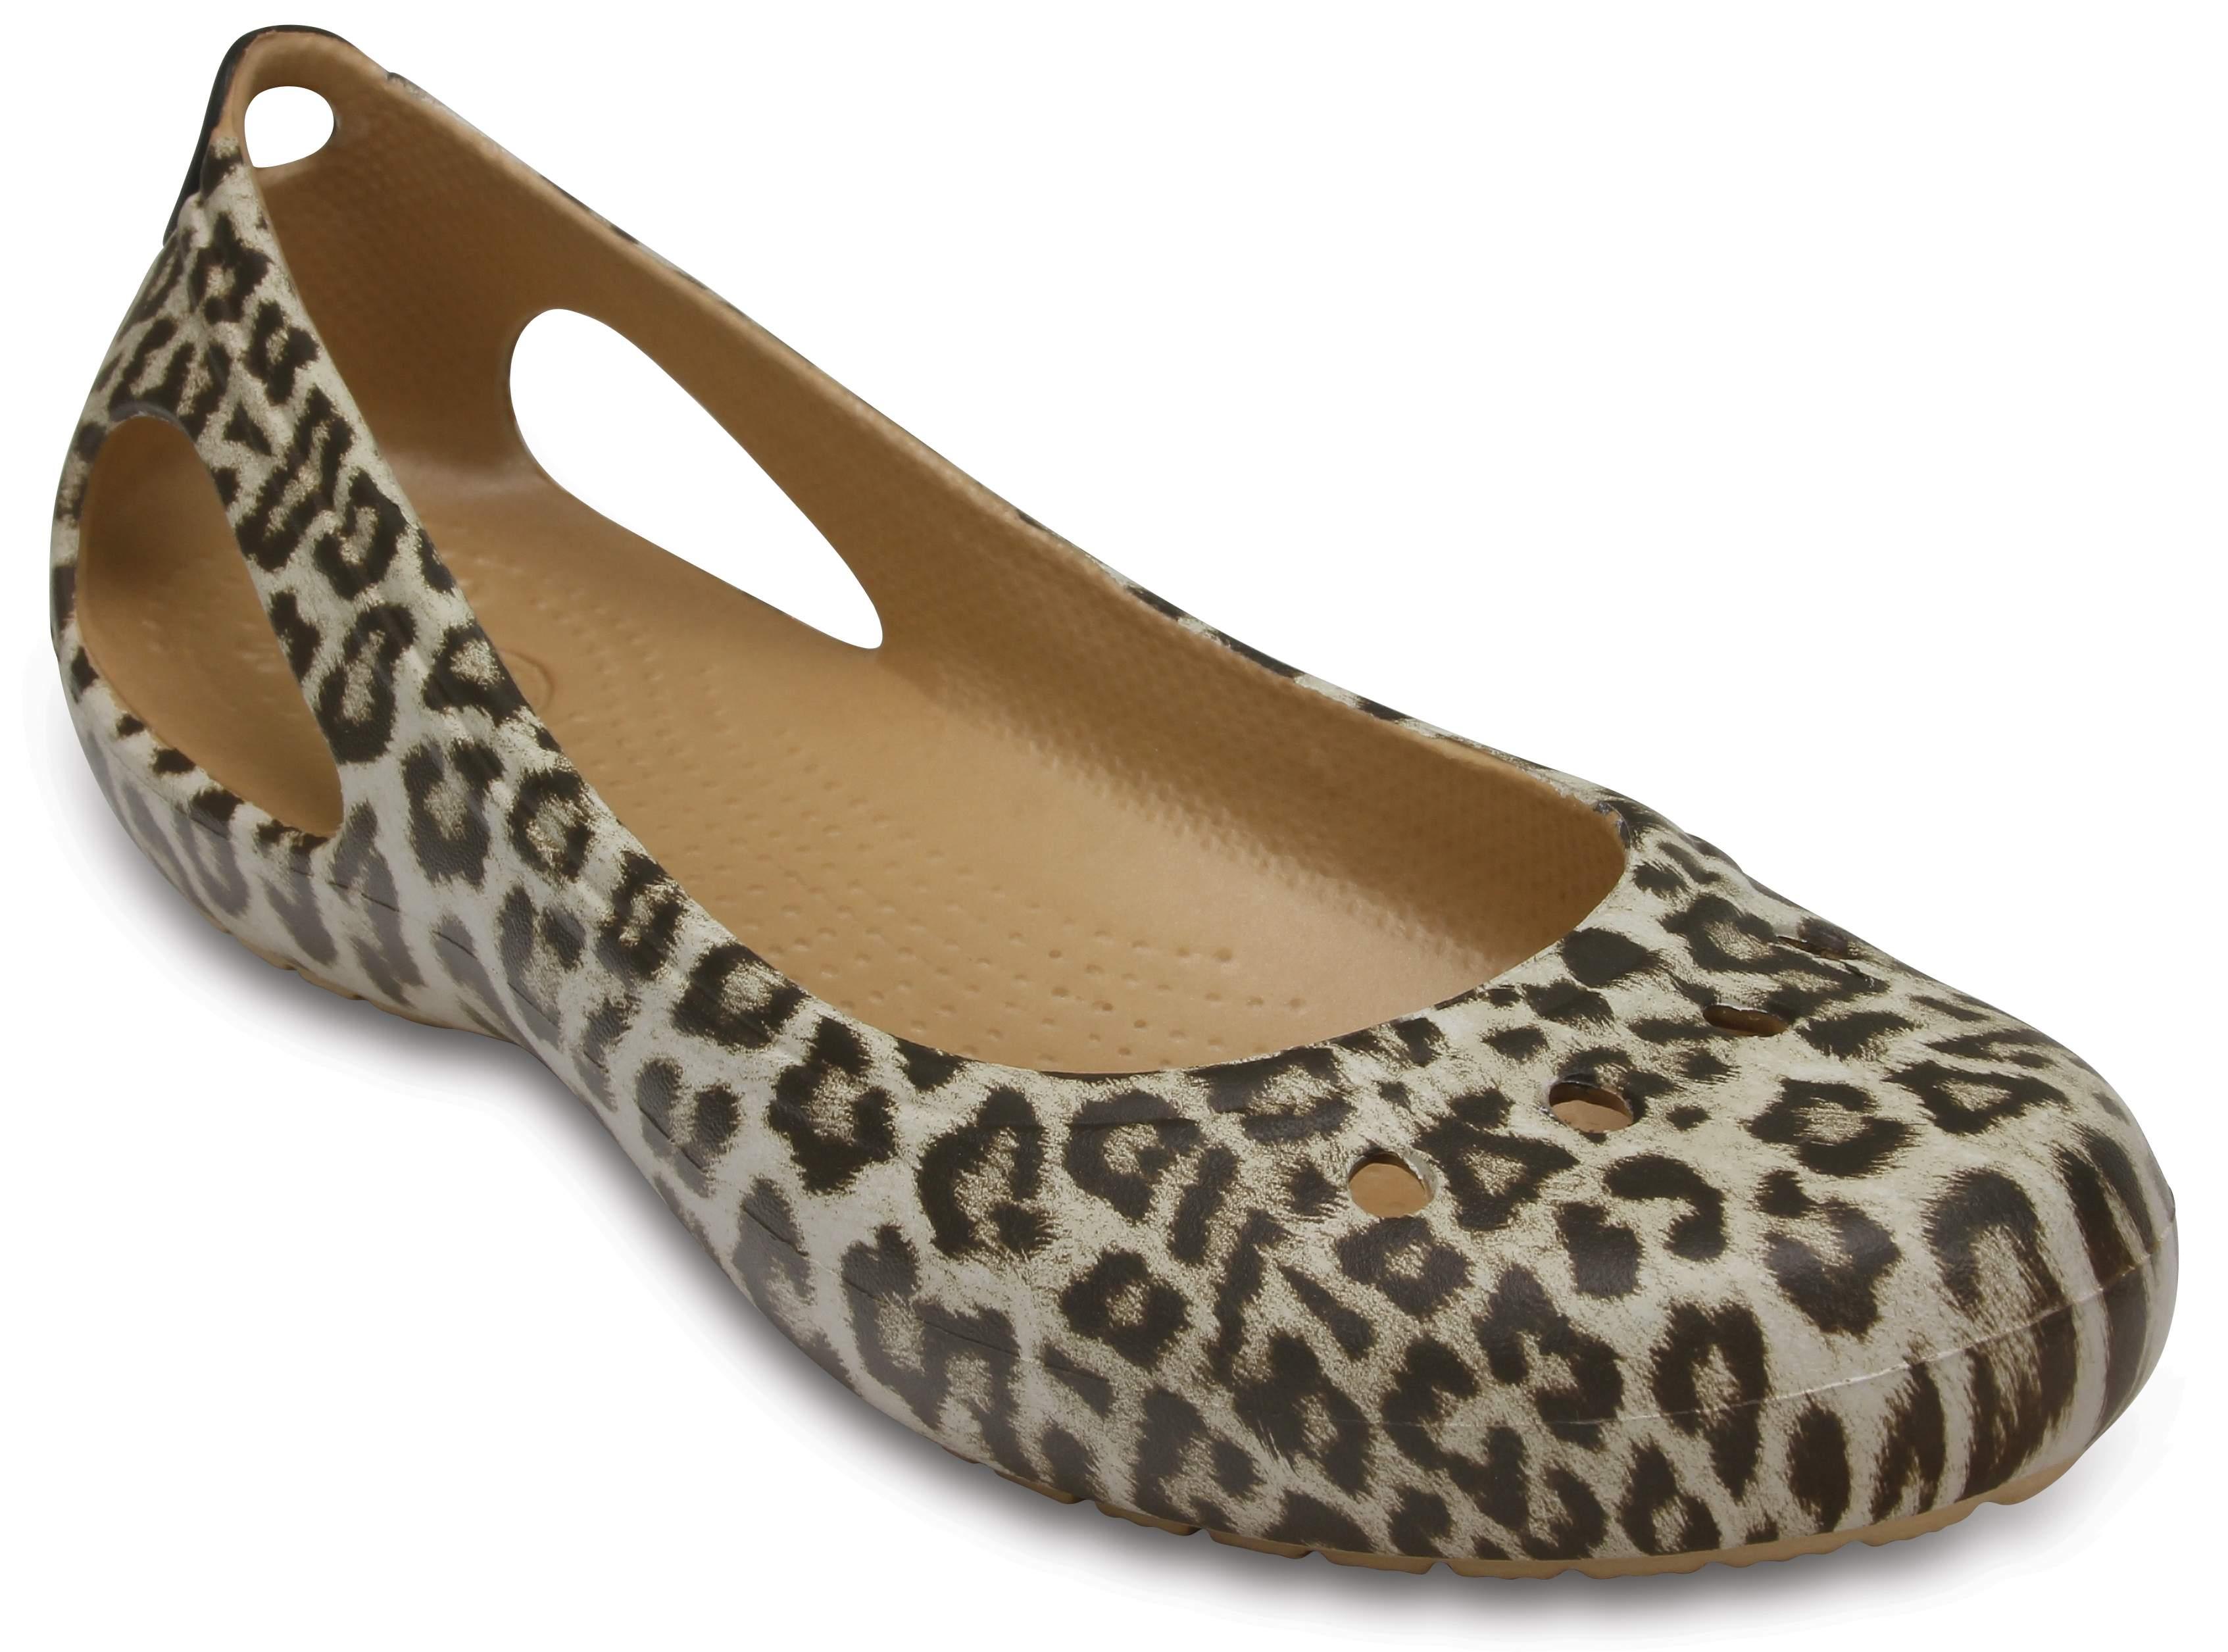 Crocs: 50% Off Select Sale Sty...